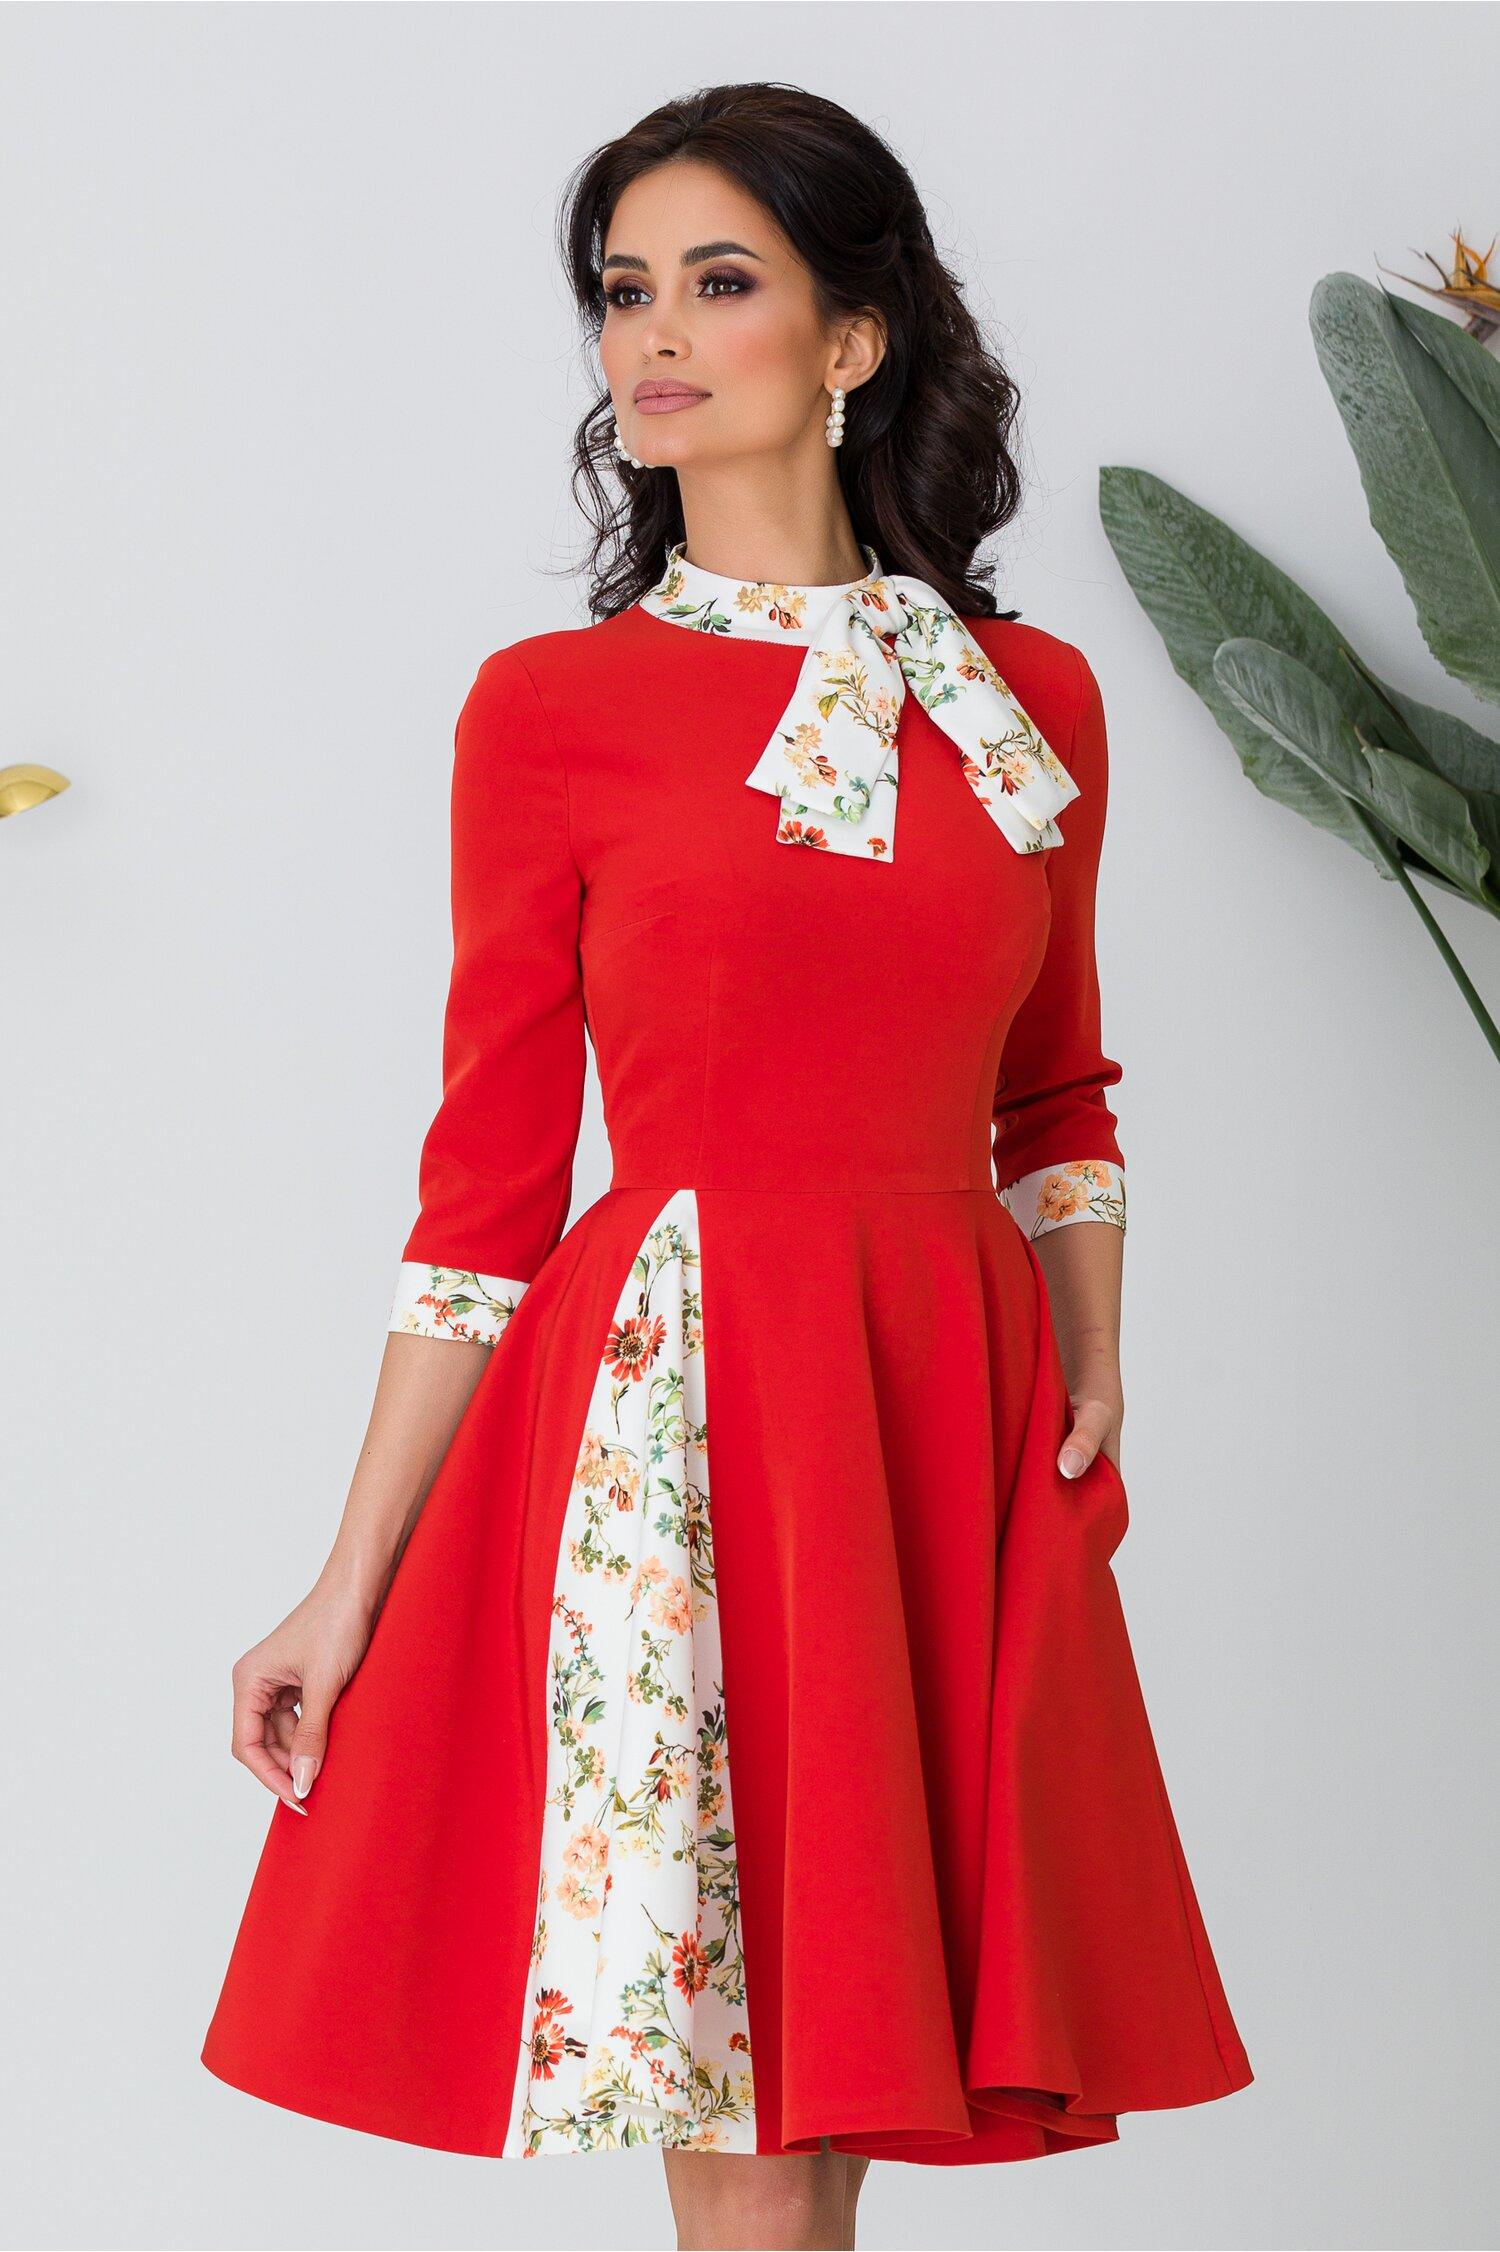 Rochie MBG rosie cu imprimeuri florale si funda la gat